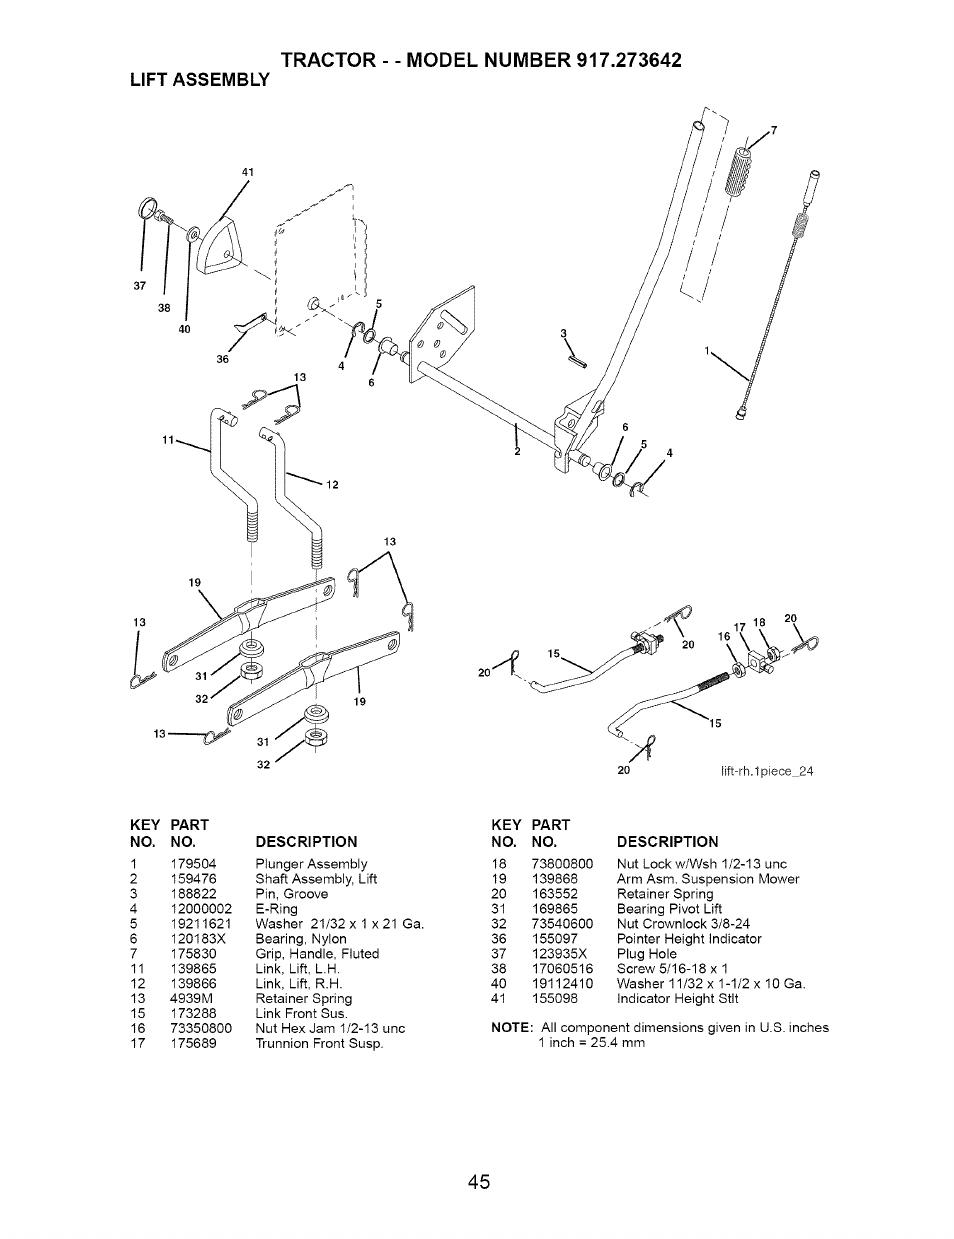 Craftsman Dyt 4000 Manual : Lift assembly craftsman dyt  user manual